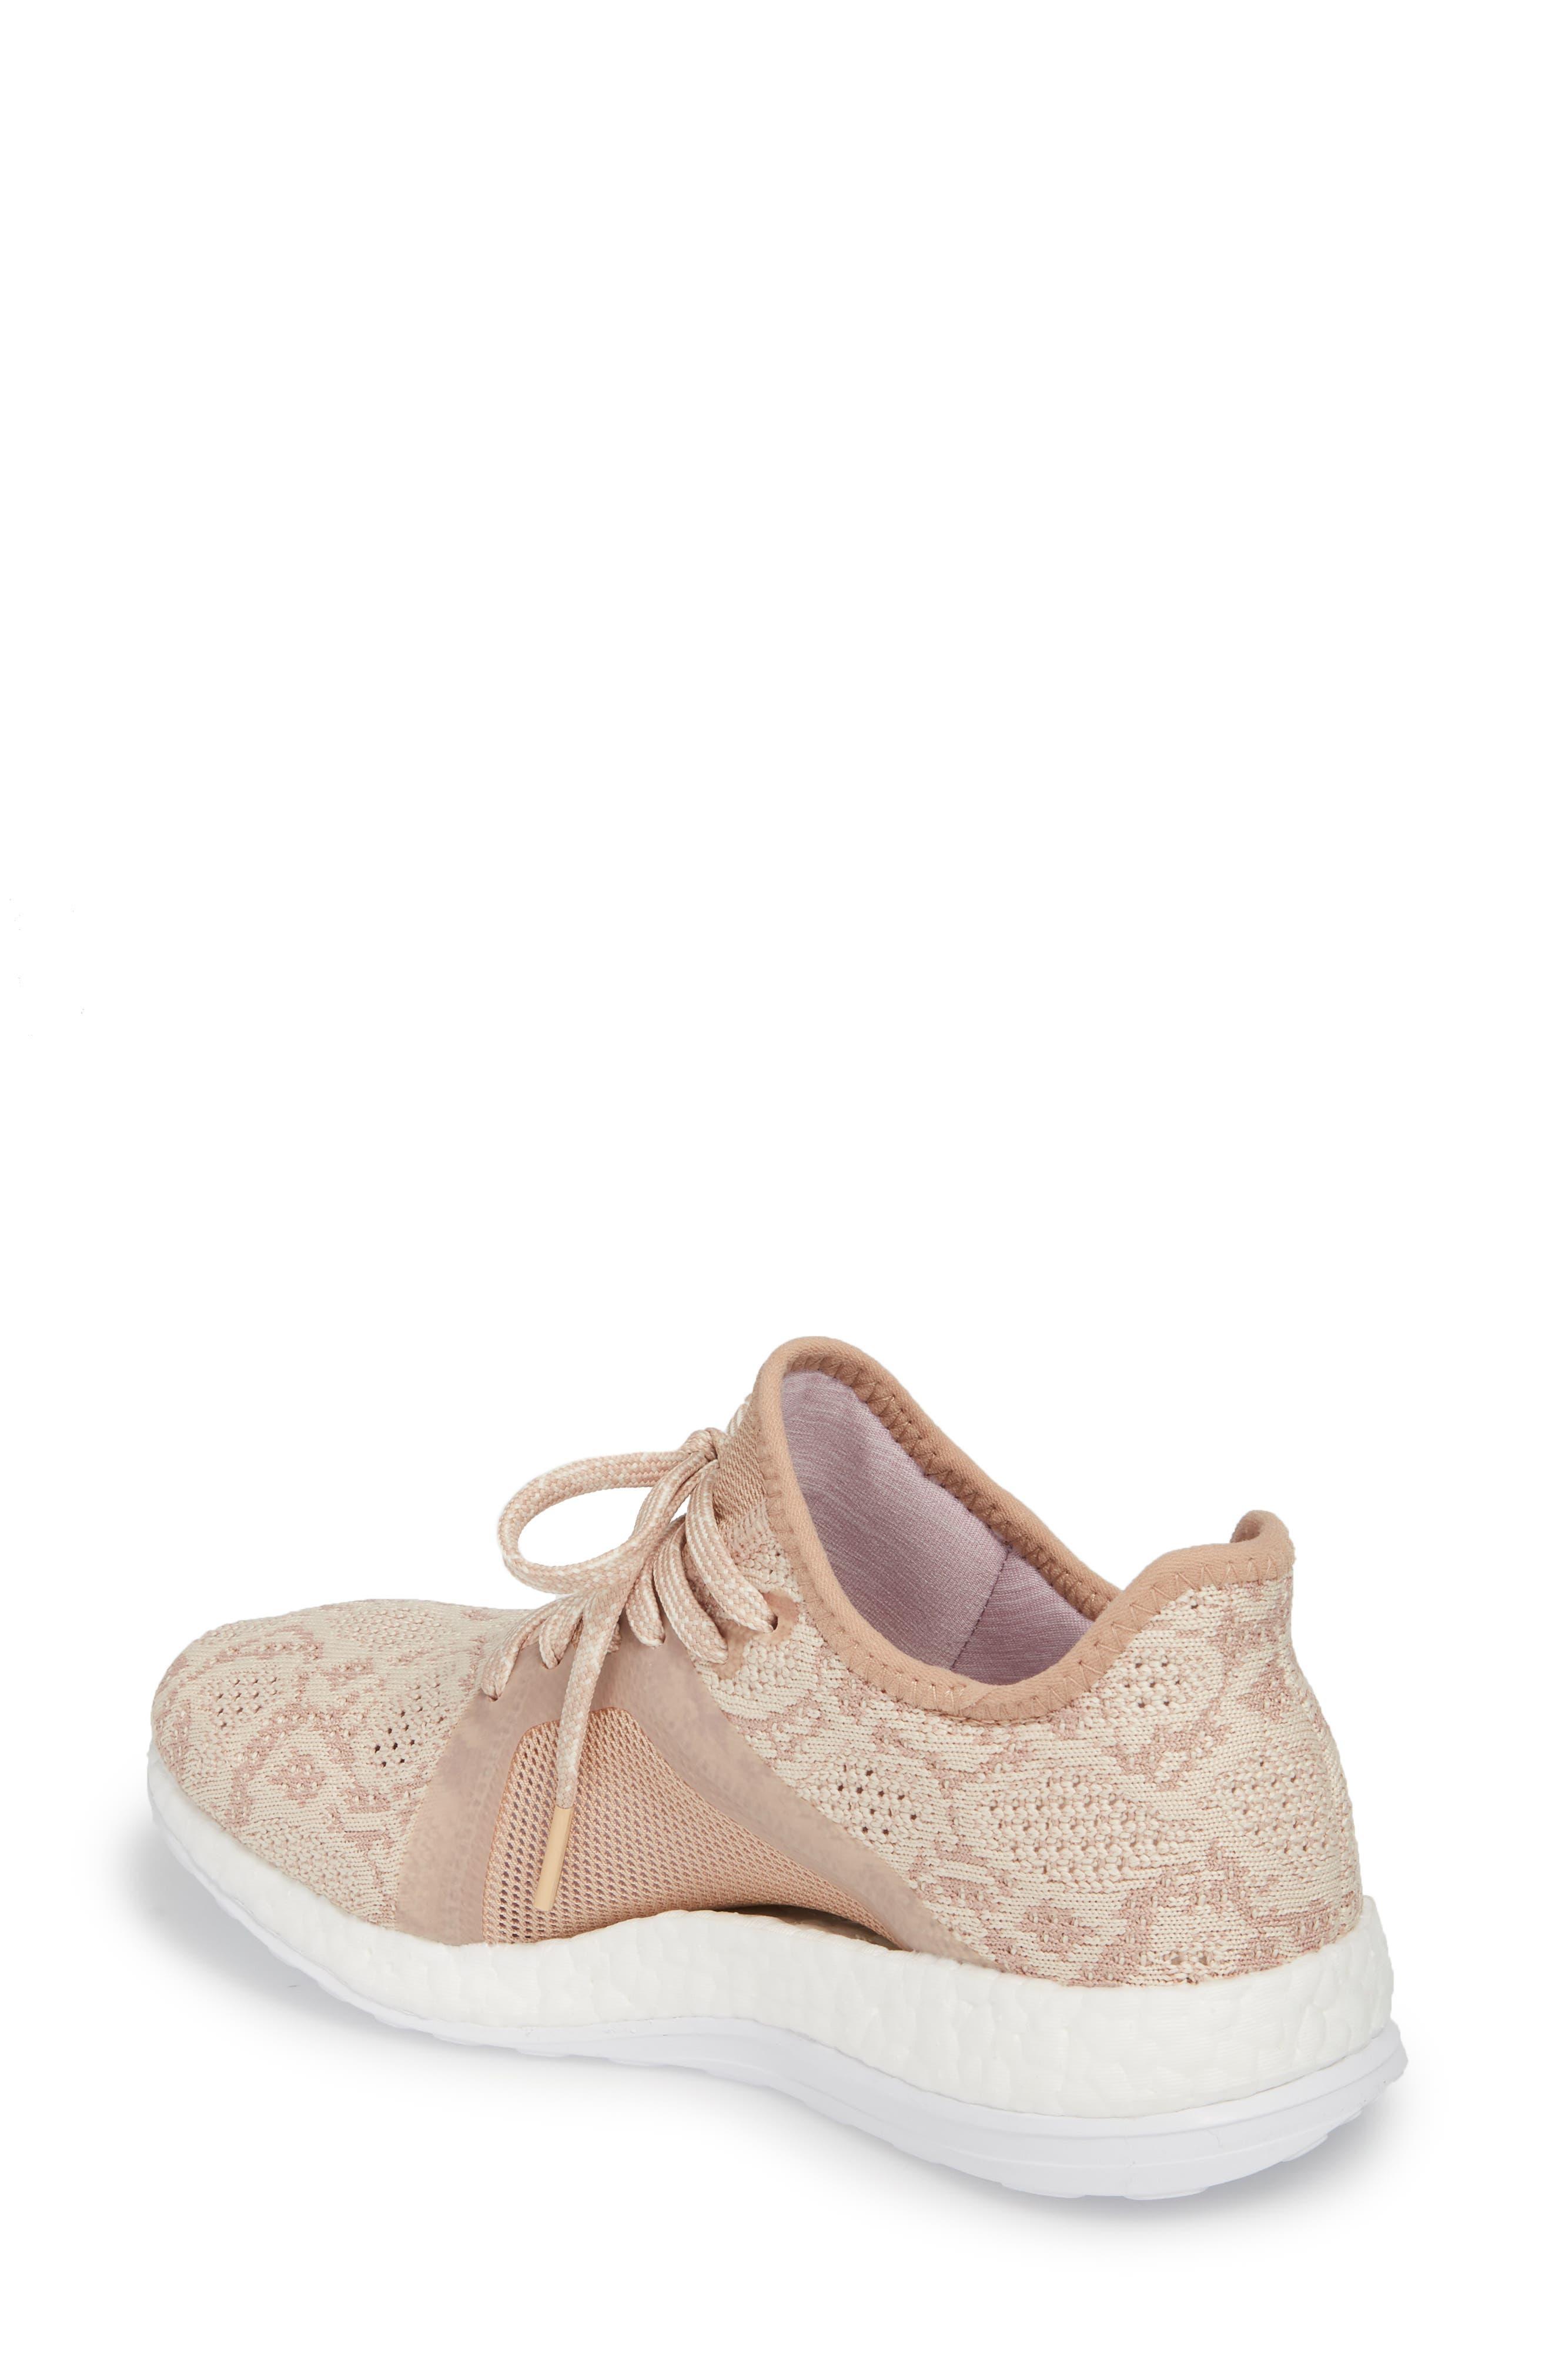 PureBoost X Element Knit Running Shoe,                             Alternate thumbnail 2, color,                             ASH PEARL/ ASH PEARL